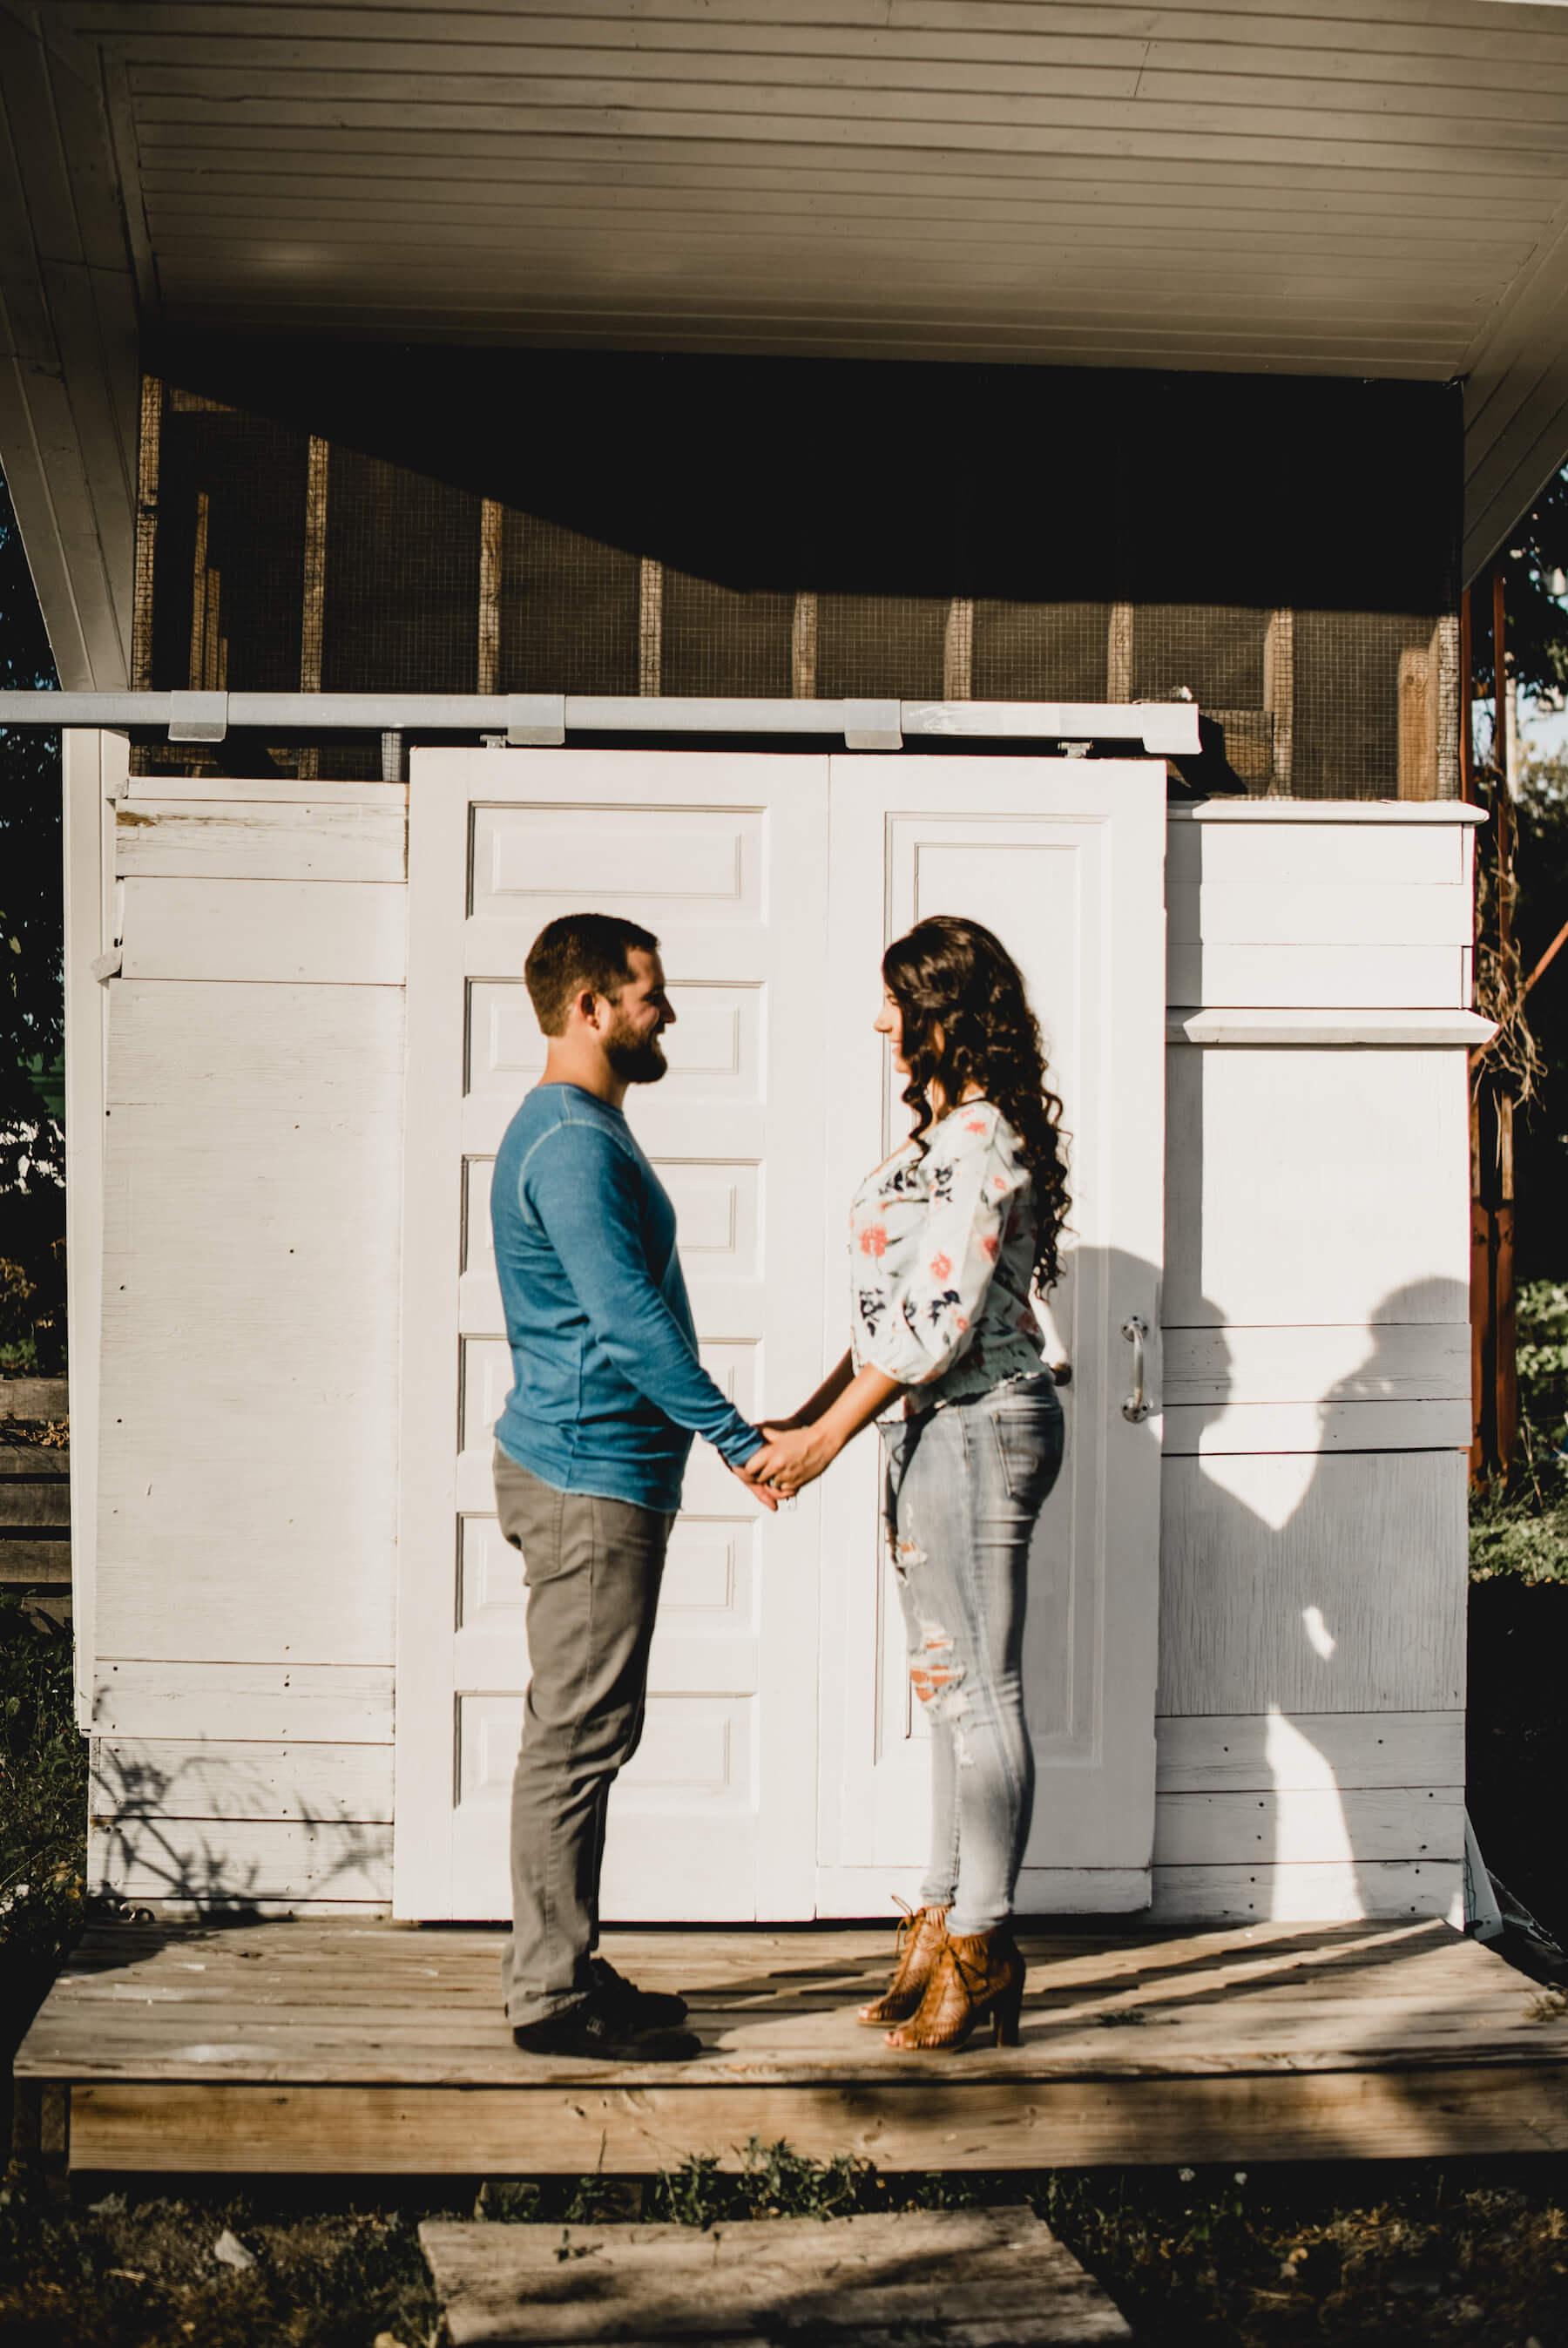 Engle-Olson-Chad-Jen-Engagement-22.jpg